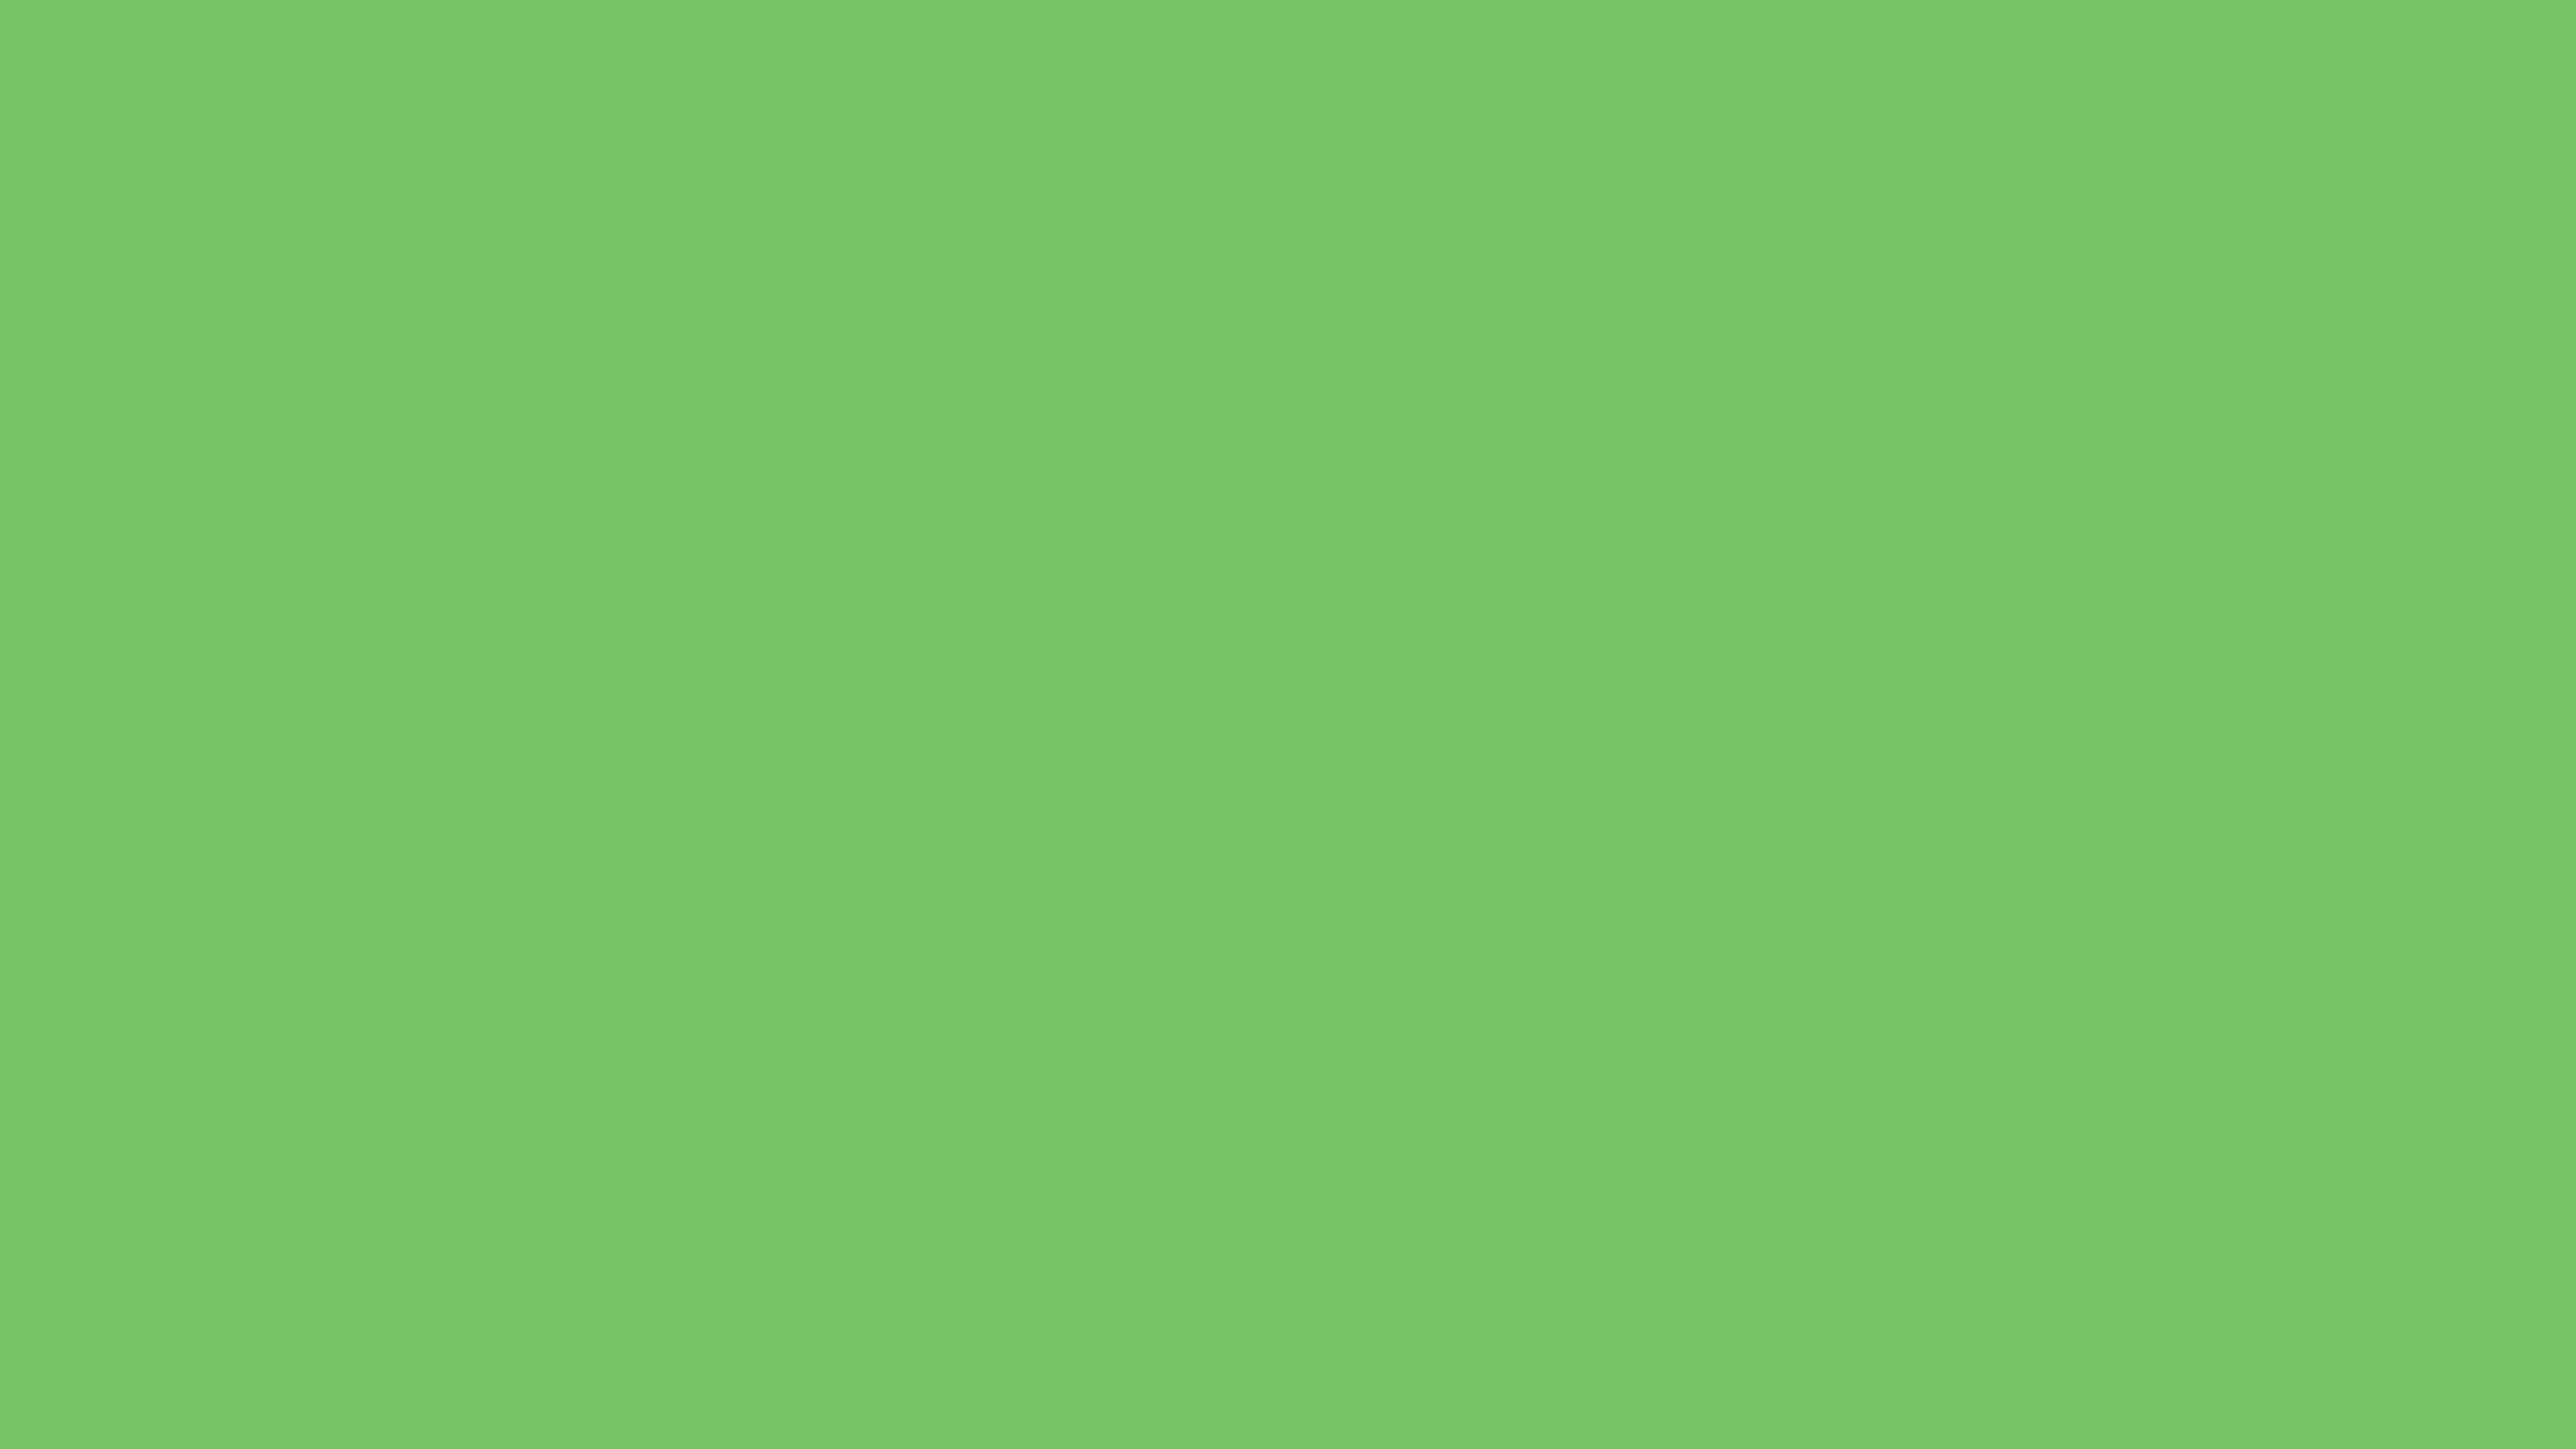 3840x2160 Mantis Solid Color Background